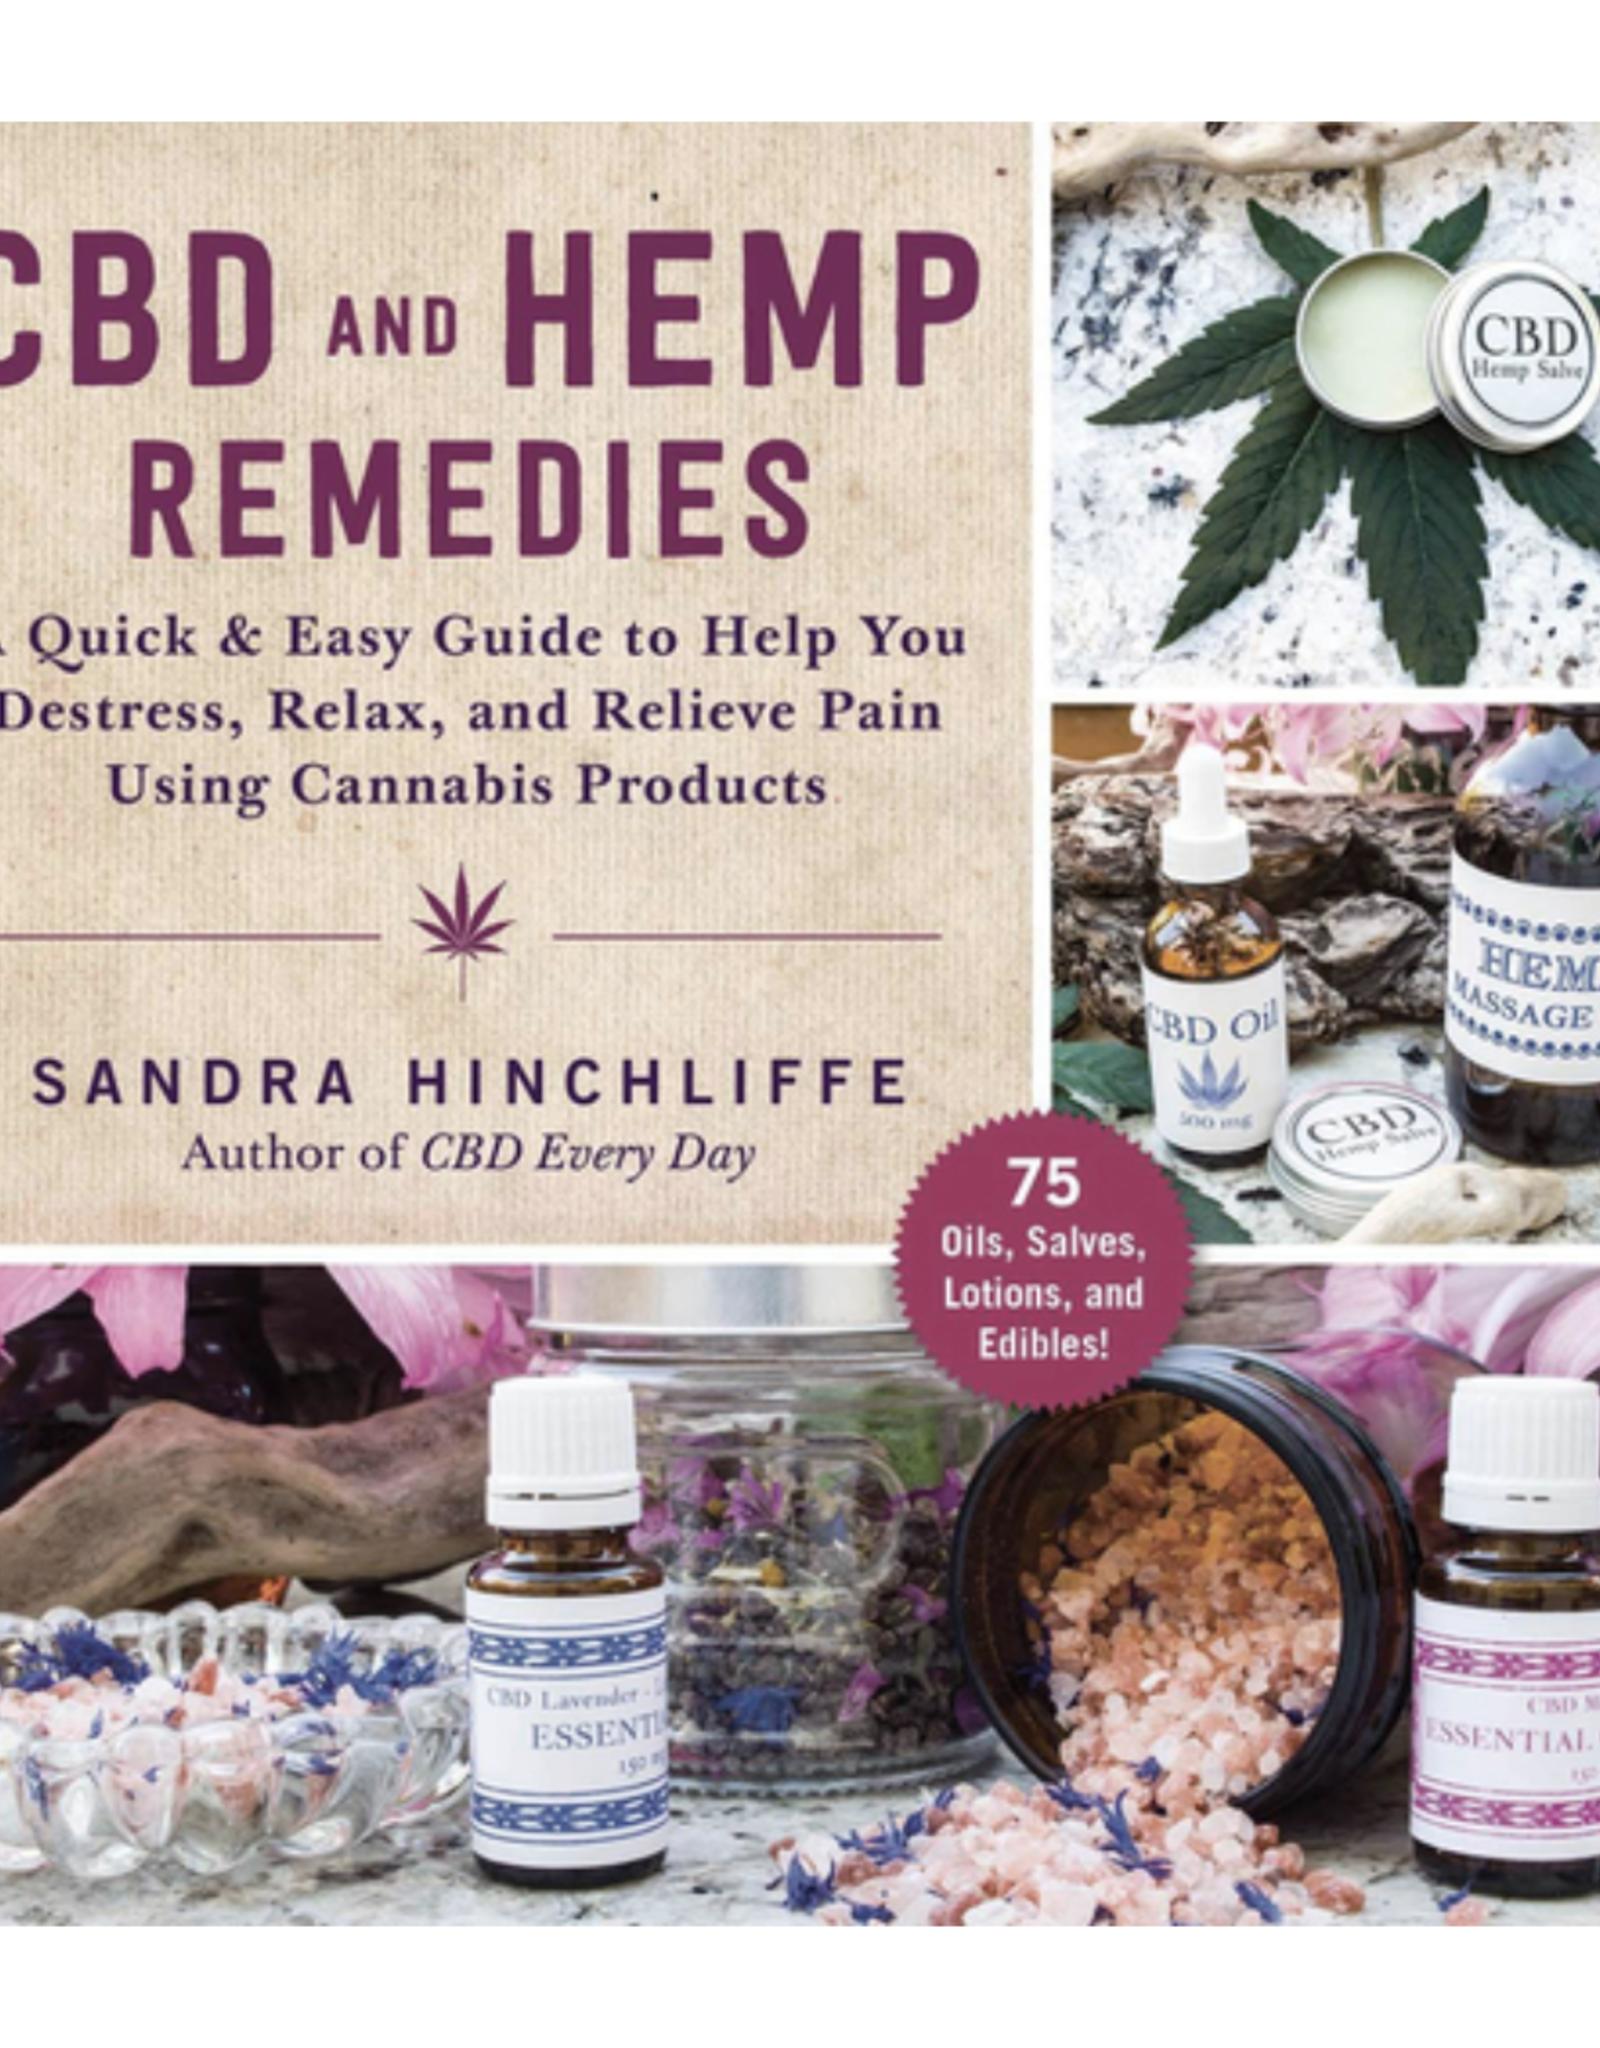 CBD and Hemp Remedies by Sandra Hinchcliffe